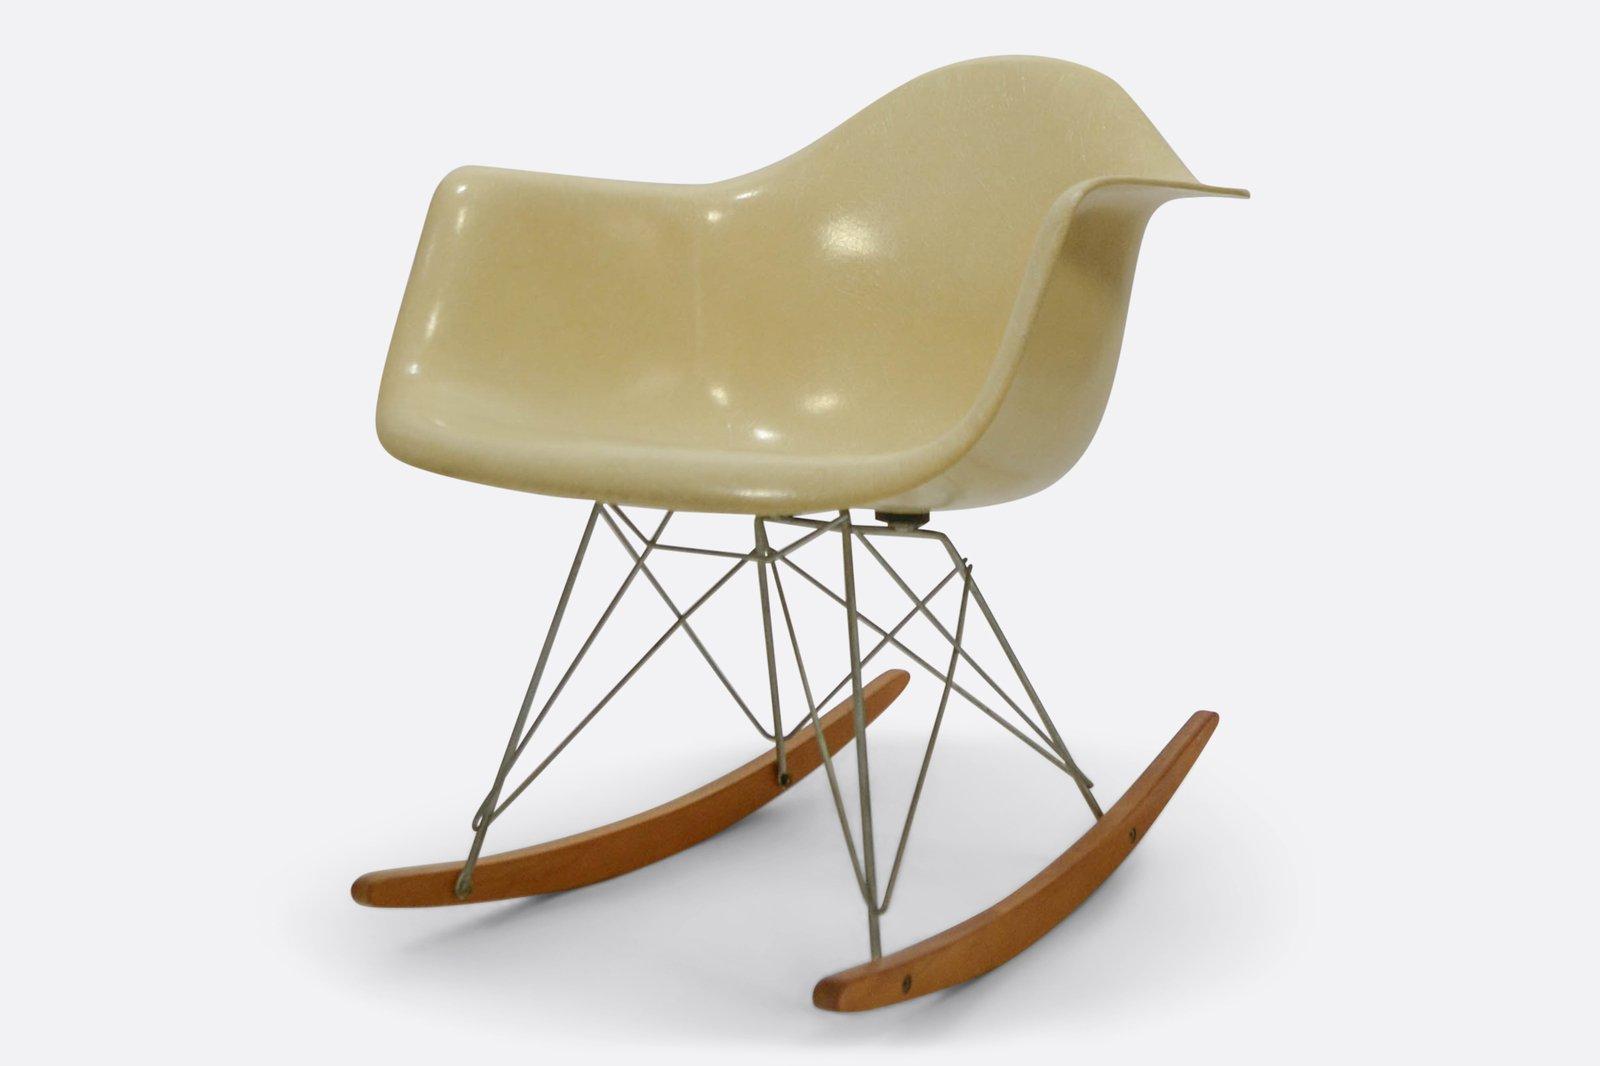 Eames Rar Stoel : Eames rar schommelstoel product video furnaround youtube